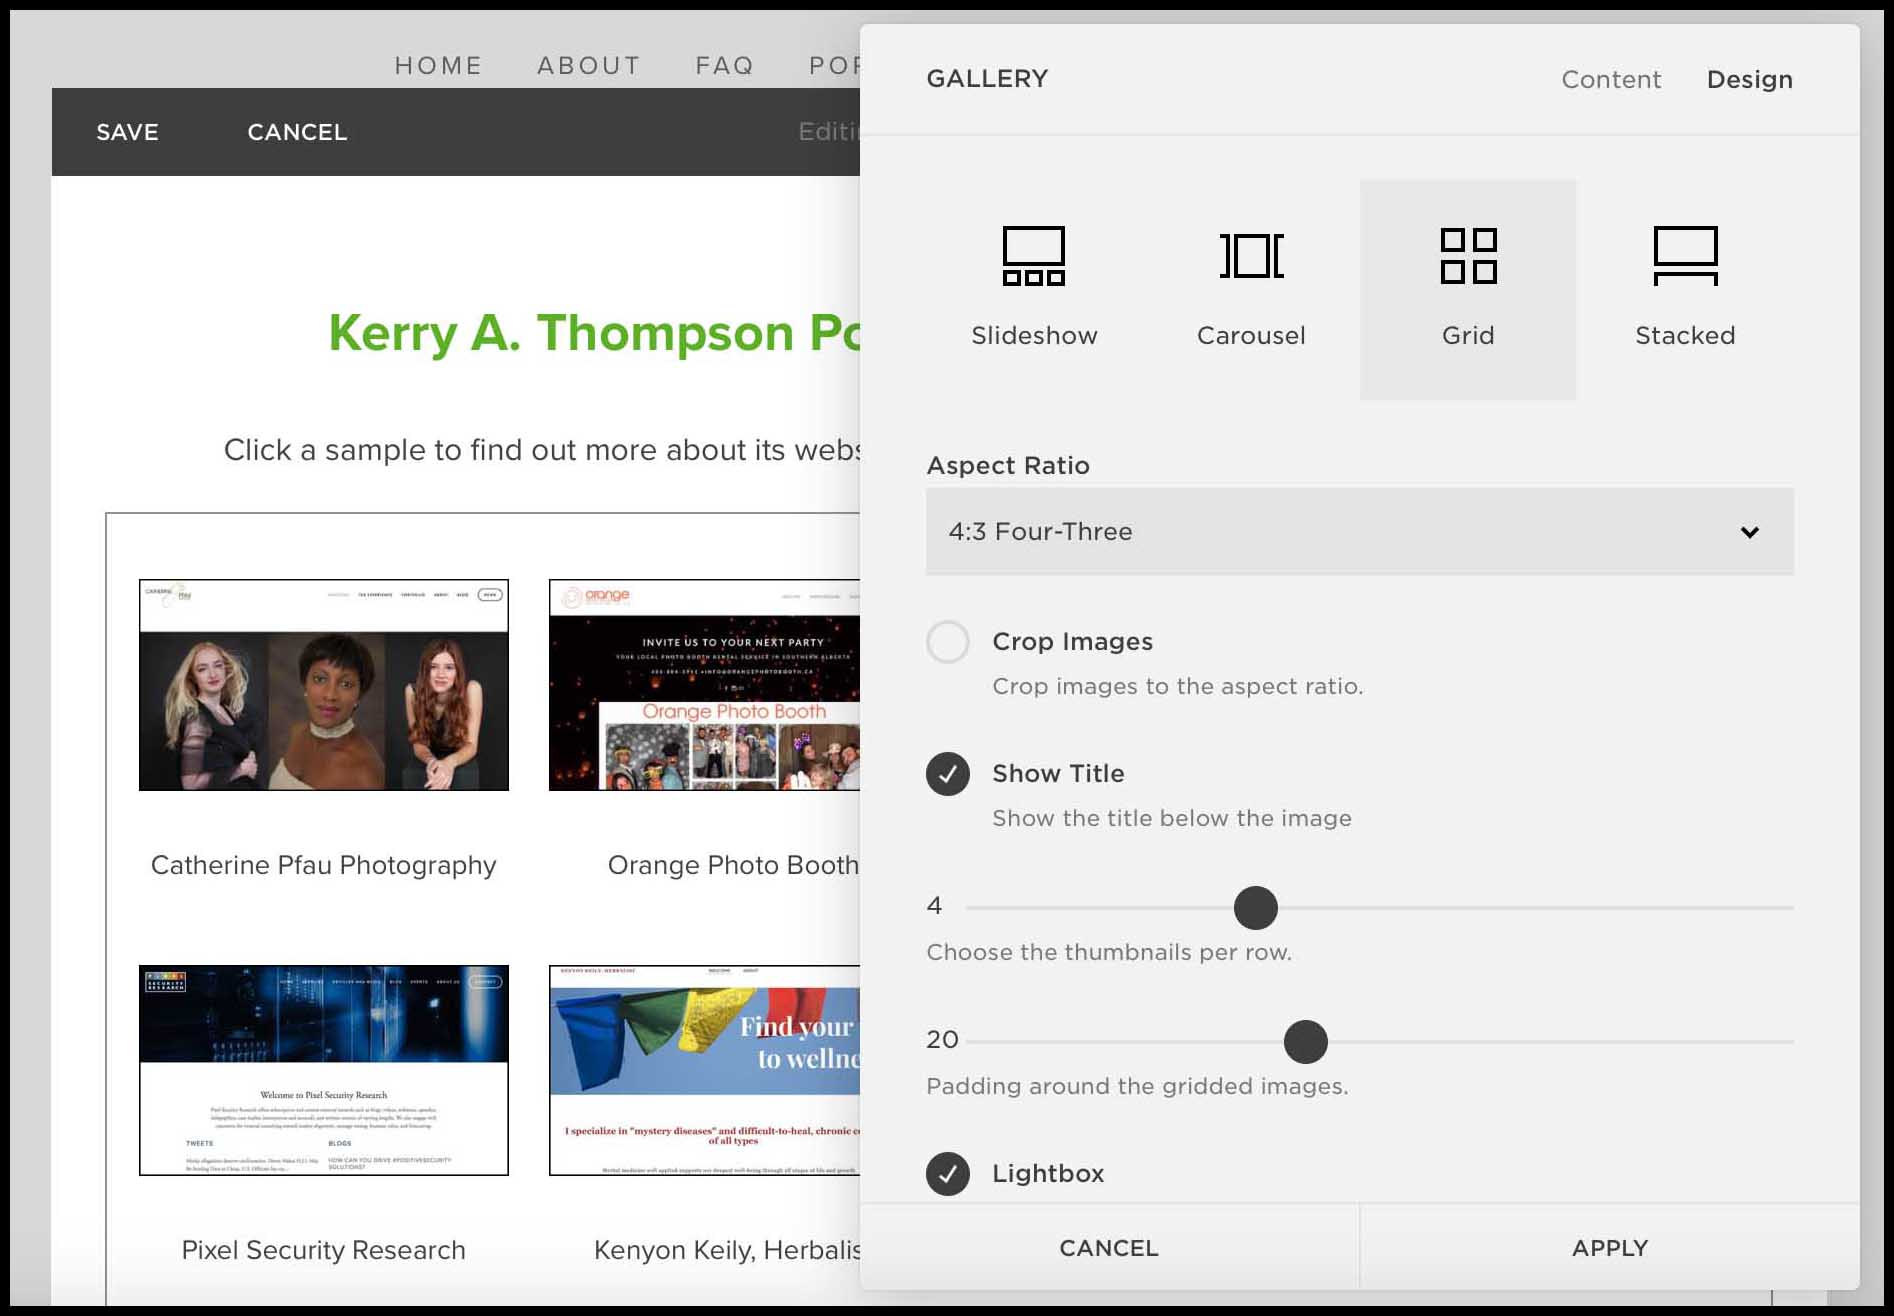 KerryAThompson.com Blog: Portfolio Makeover, Grid-style gallery block